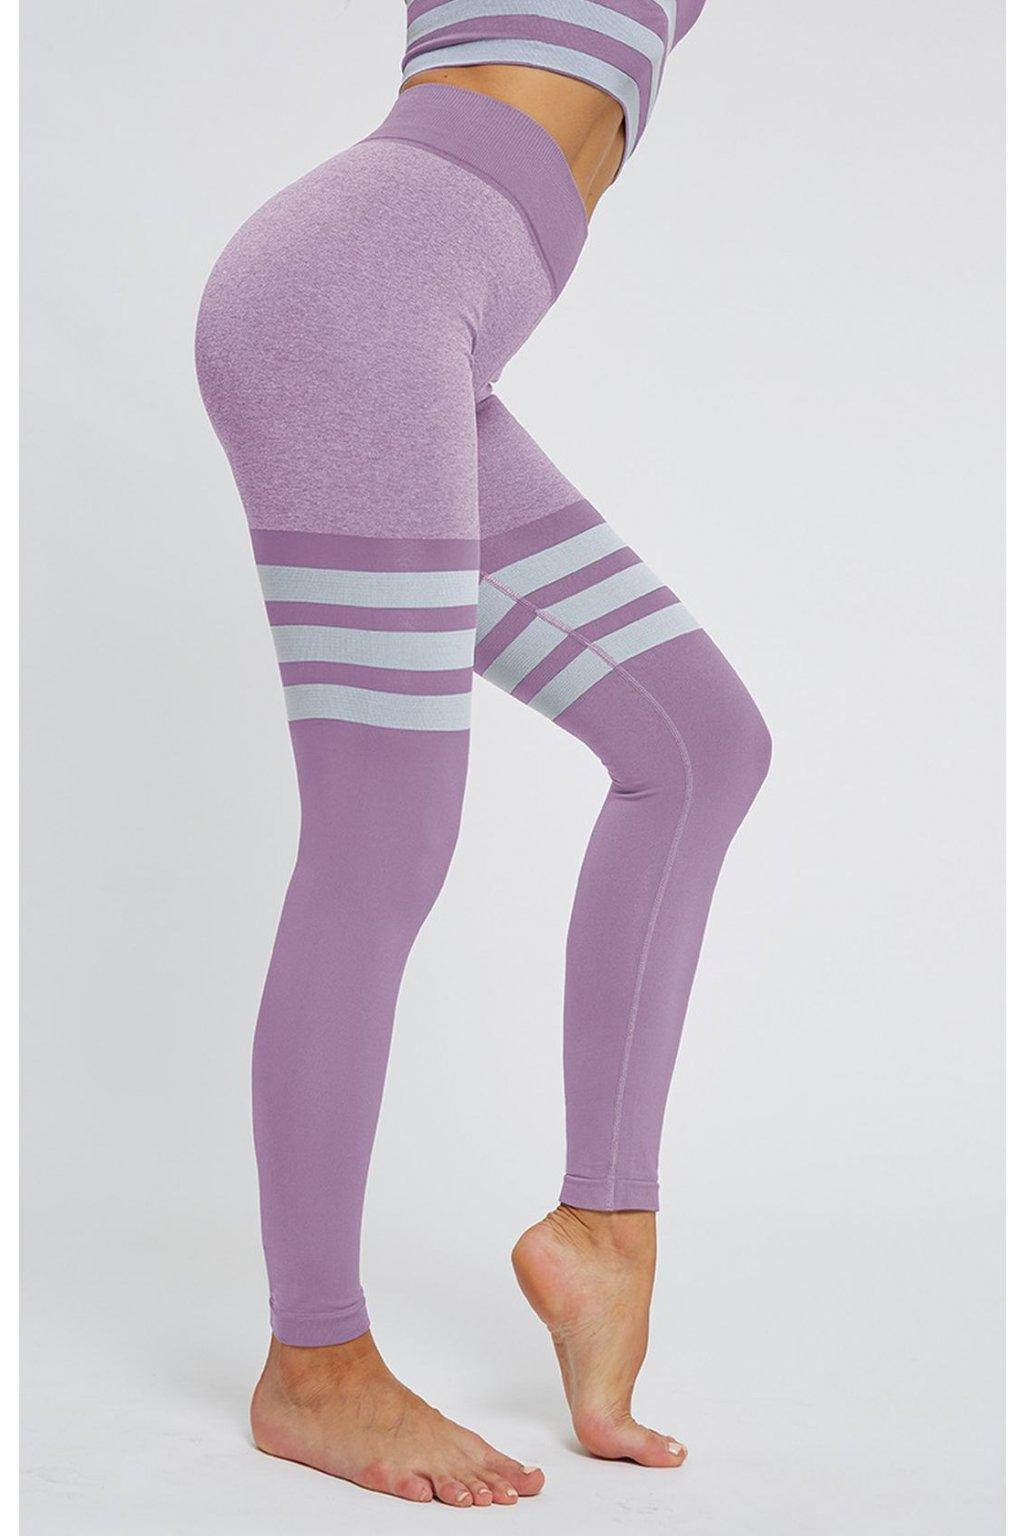 Dámské legíny Seamless High Sock Fialové